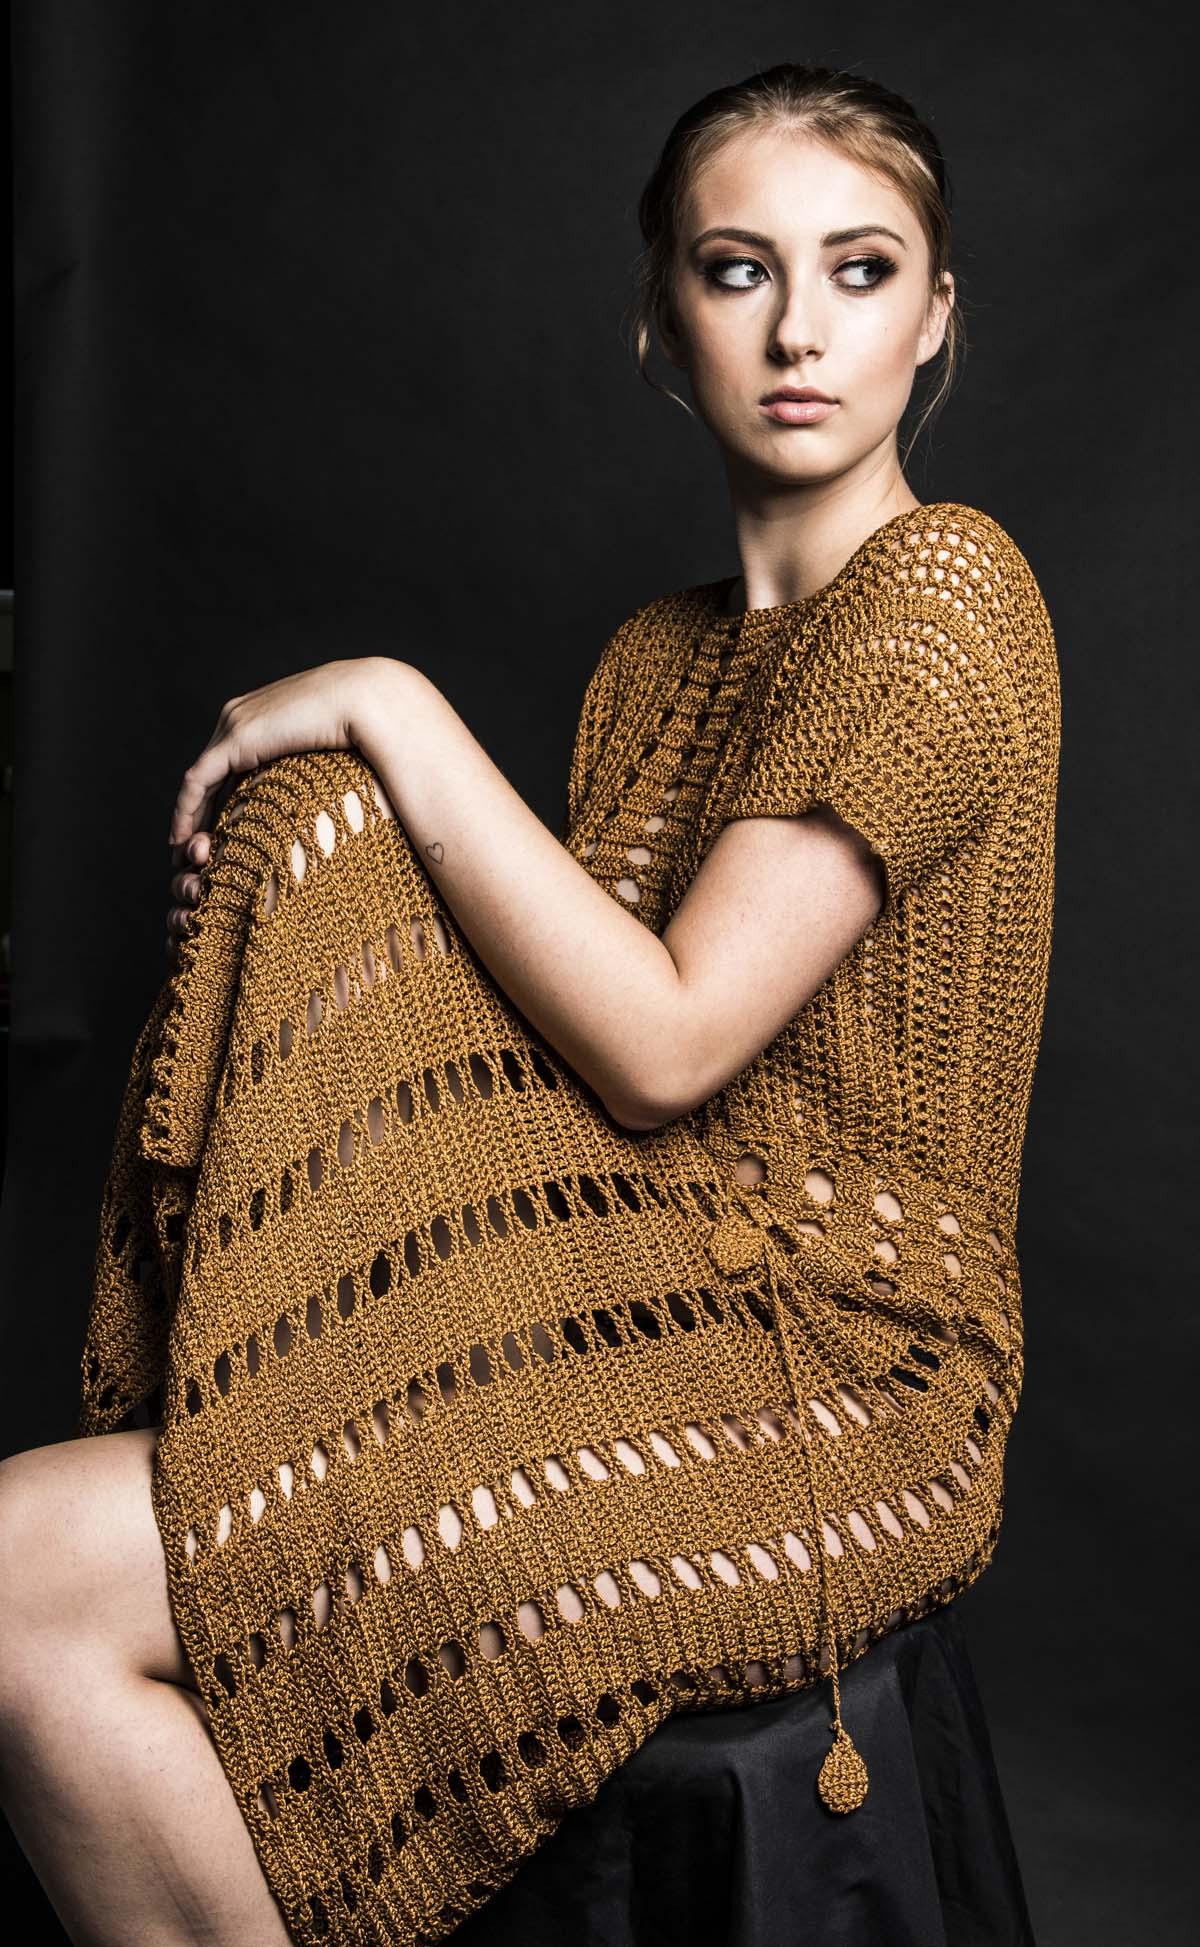 photo of a model wearing a long single piece dress in golden brown